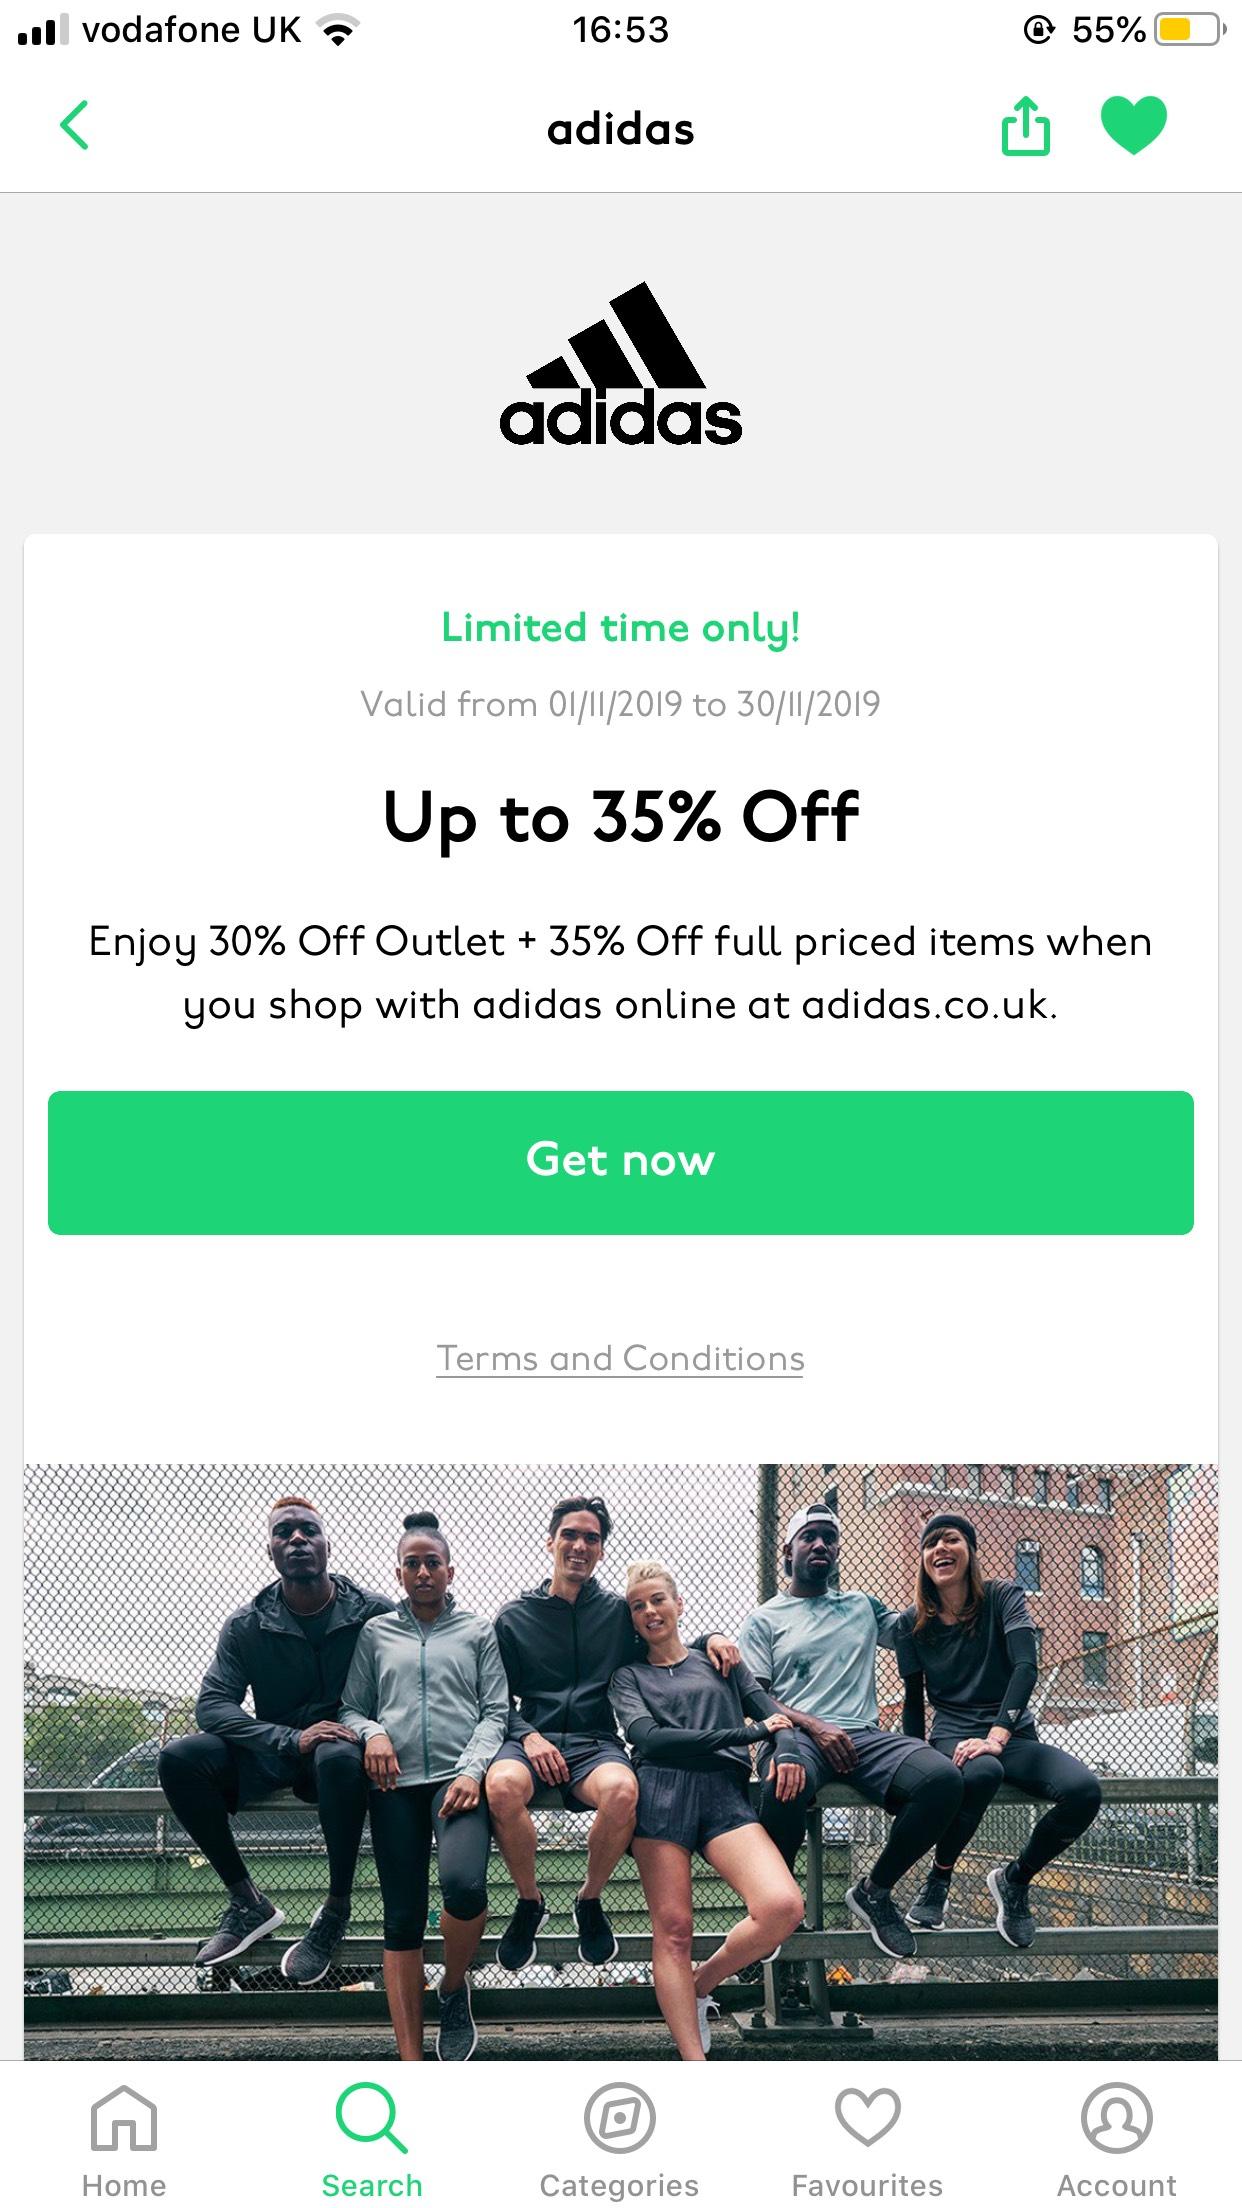 Adidas 35% off Unidays